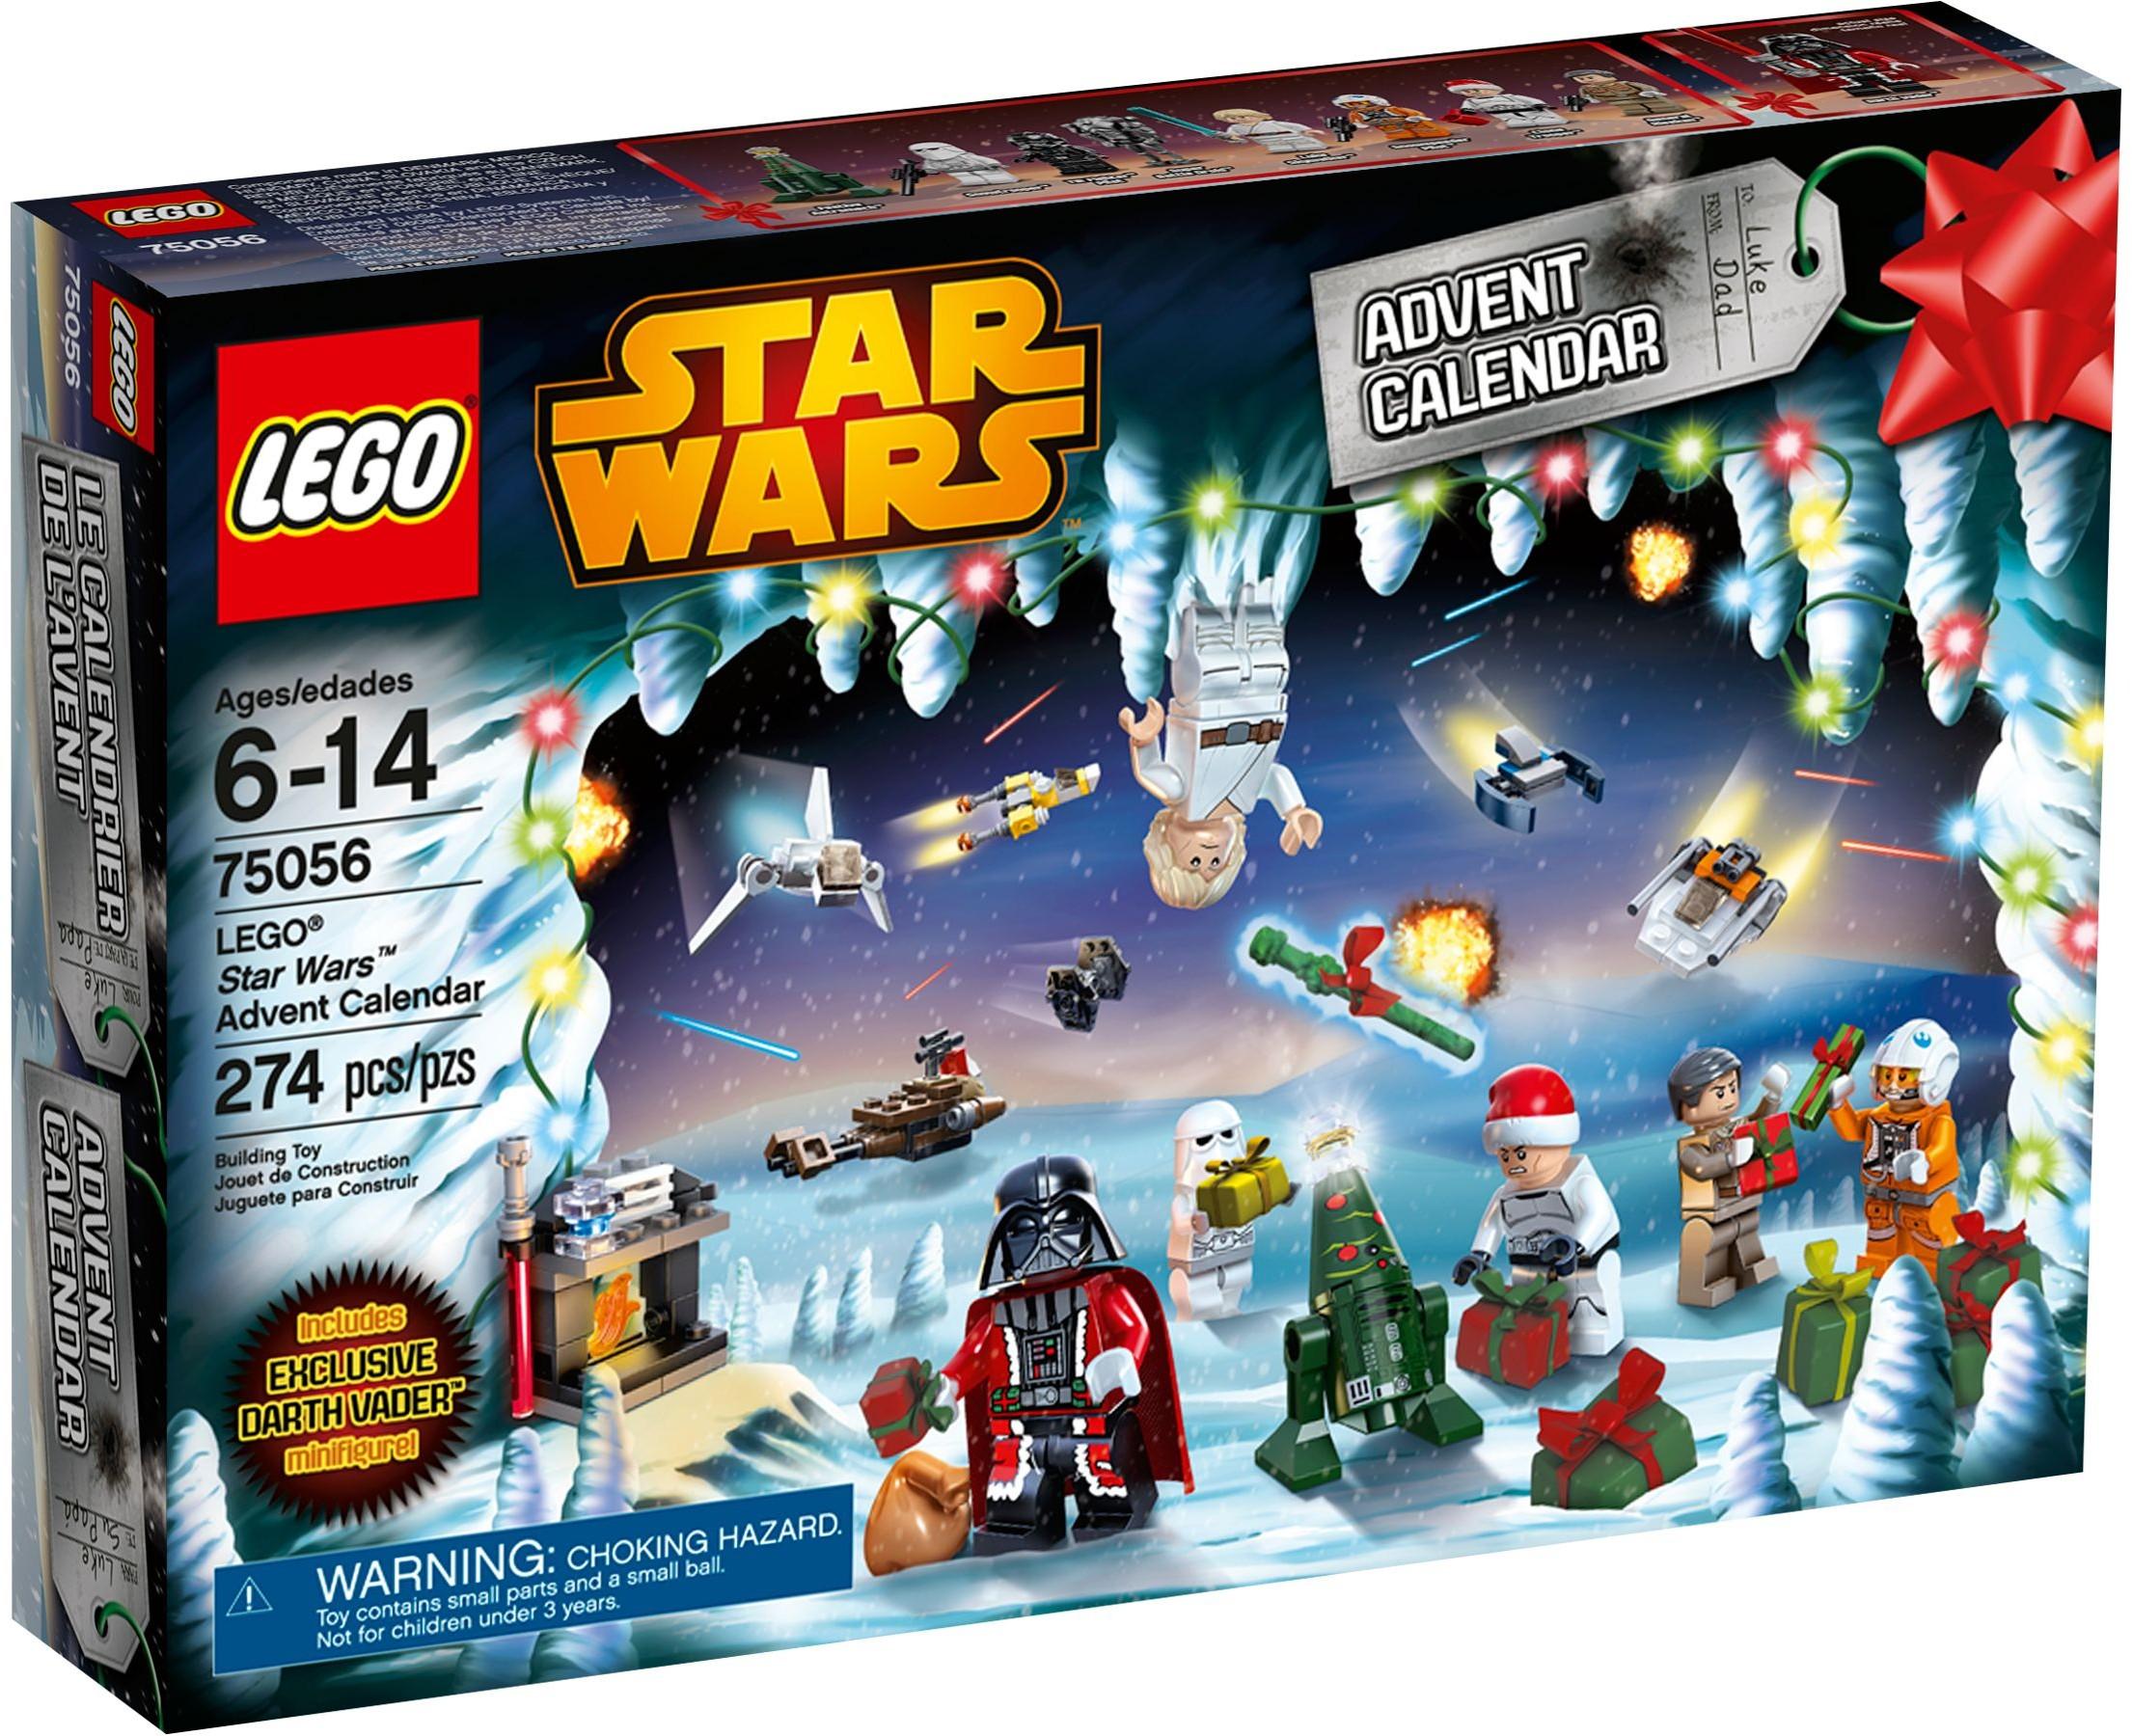 Star Wars Advent Calendar 2014